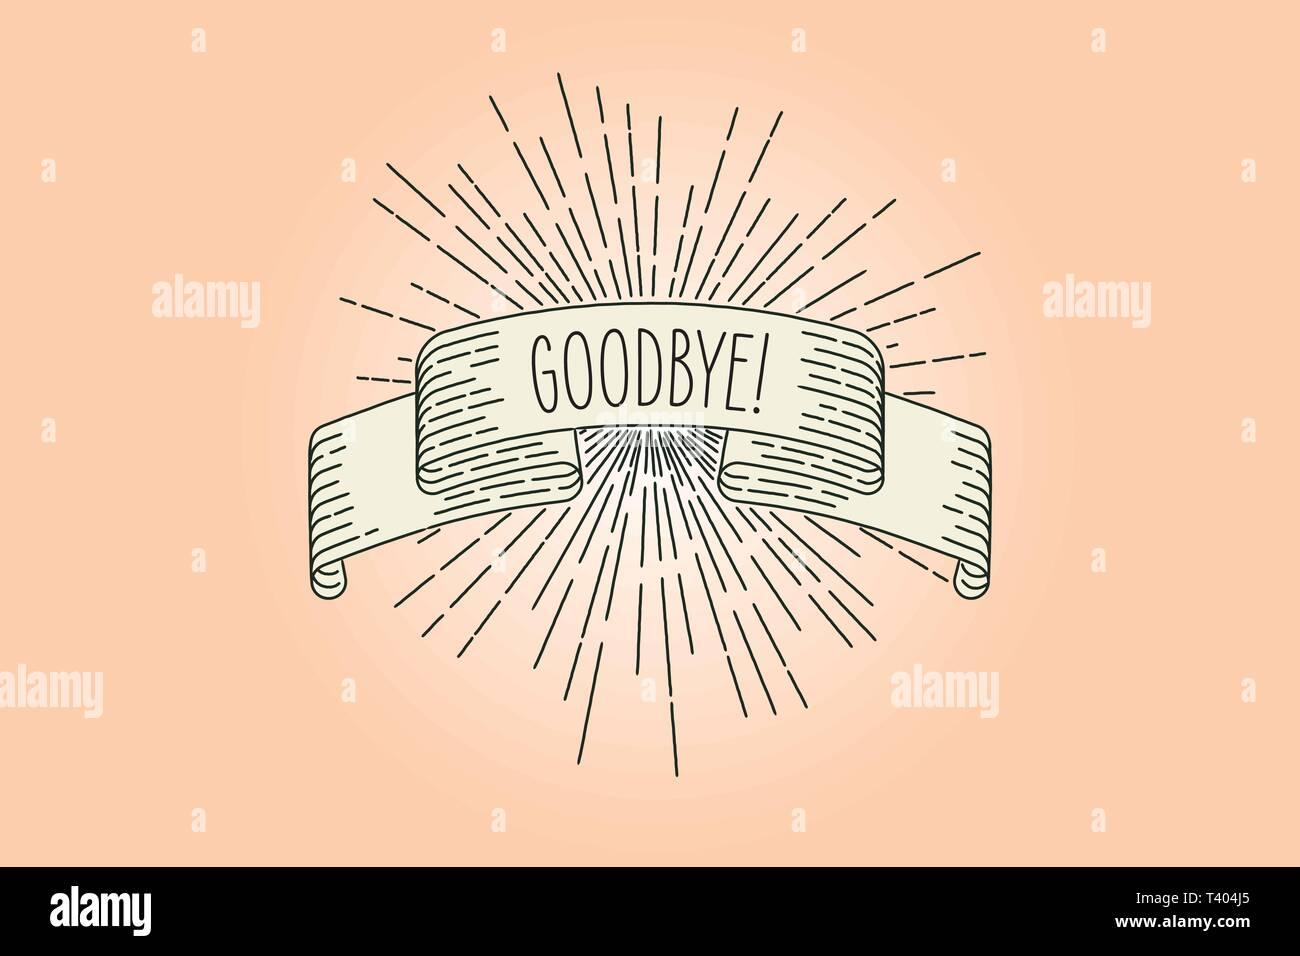 farewell stock photos  farewell stock images  alamy